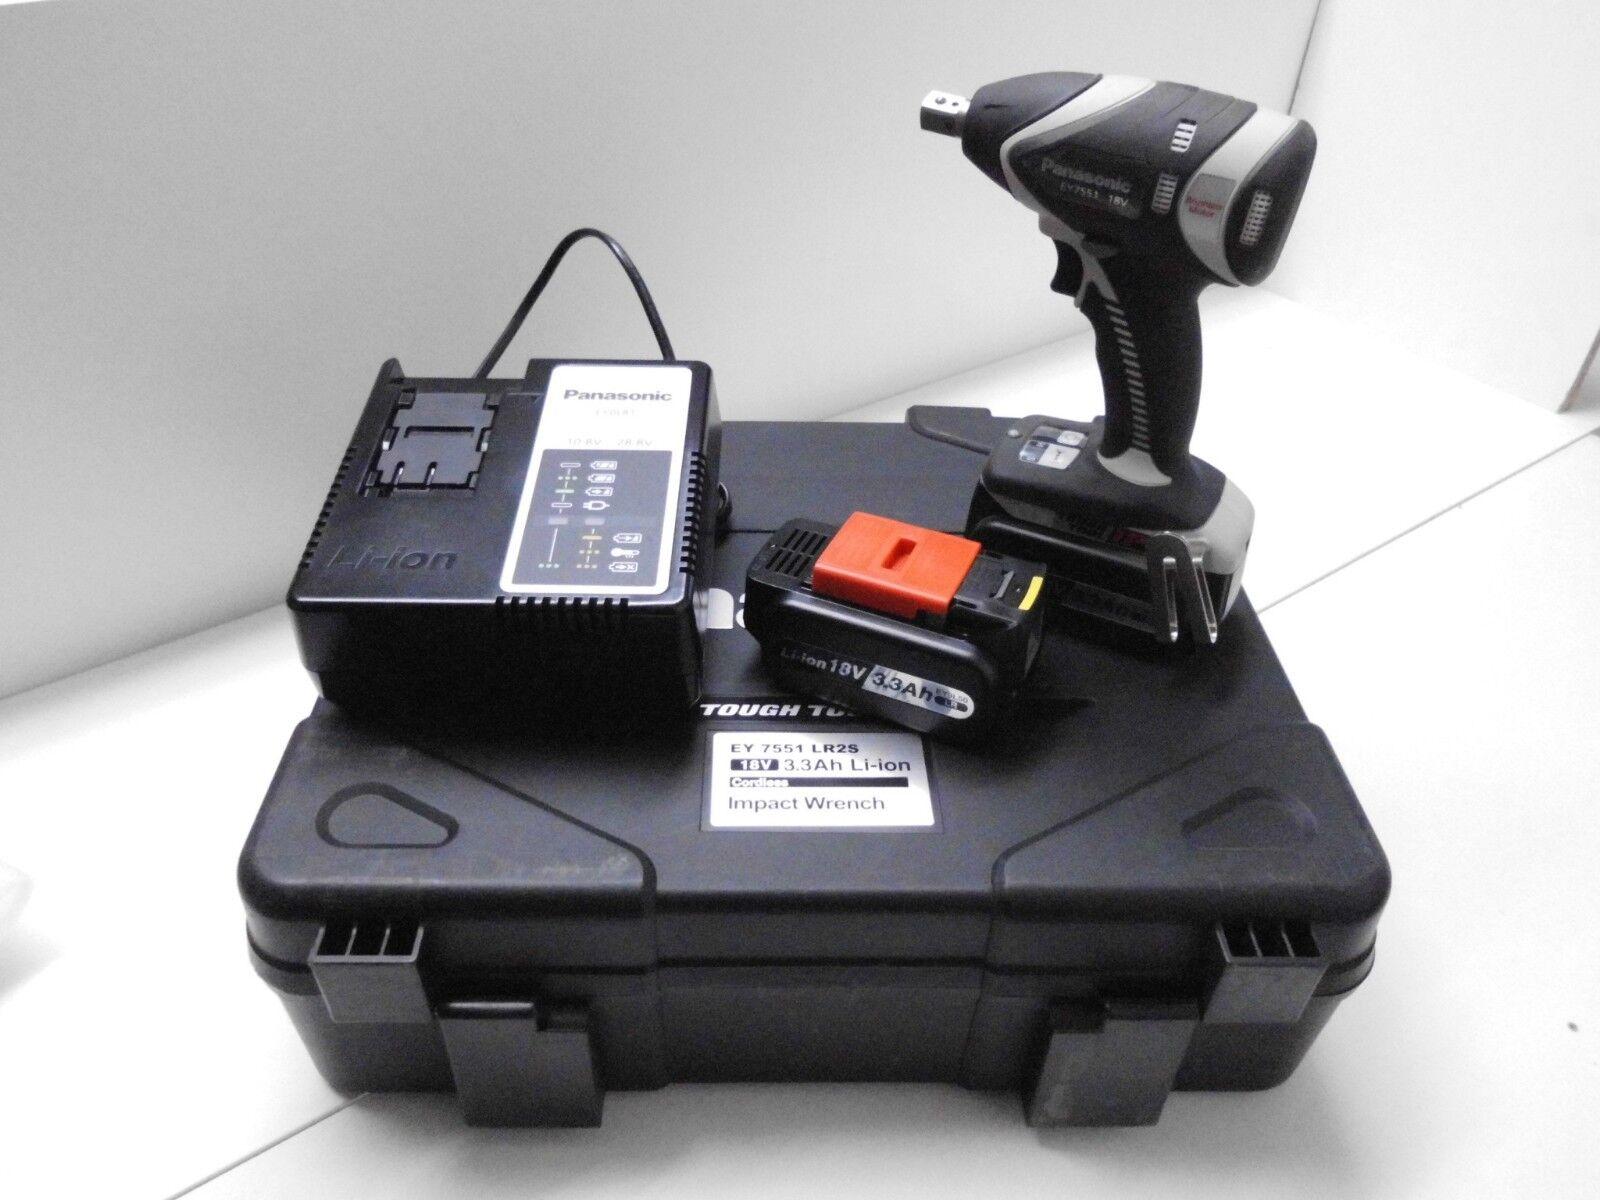 Panasonic Akku-Schlagschrauber EY 7551 LR2s